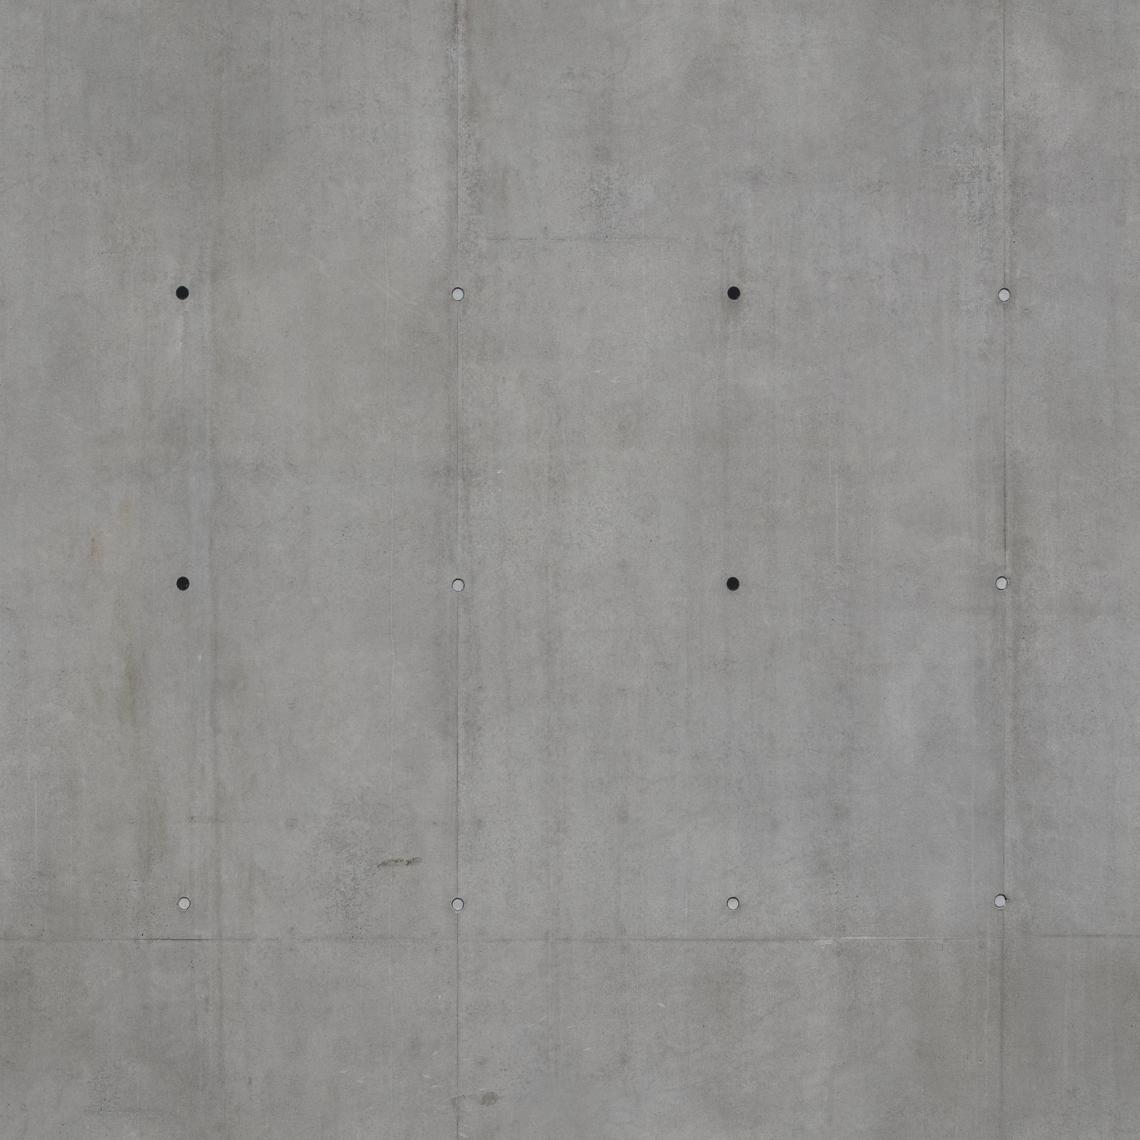 Concrete-Plain-09-Albedo